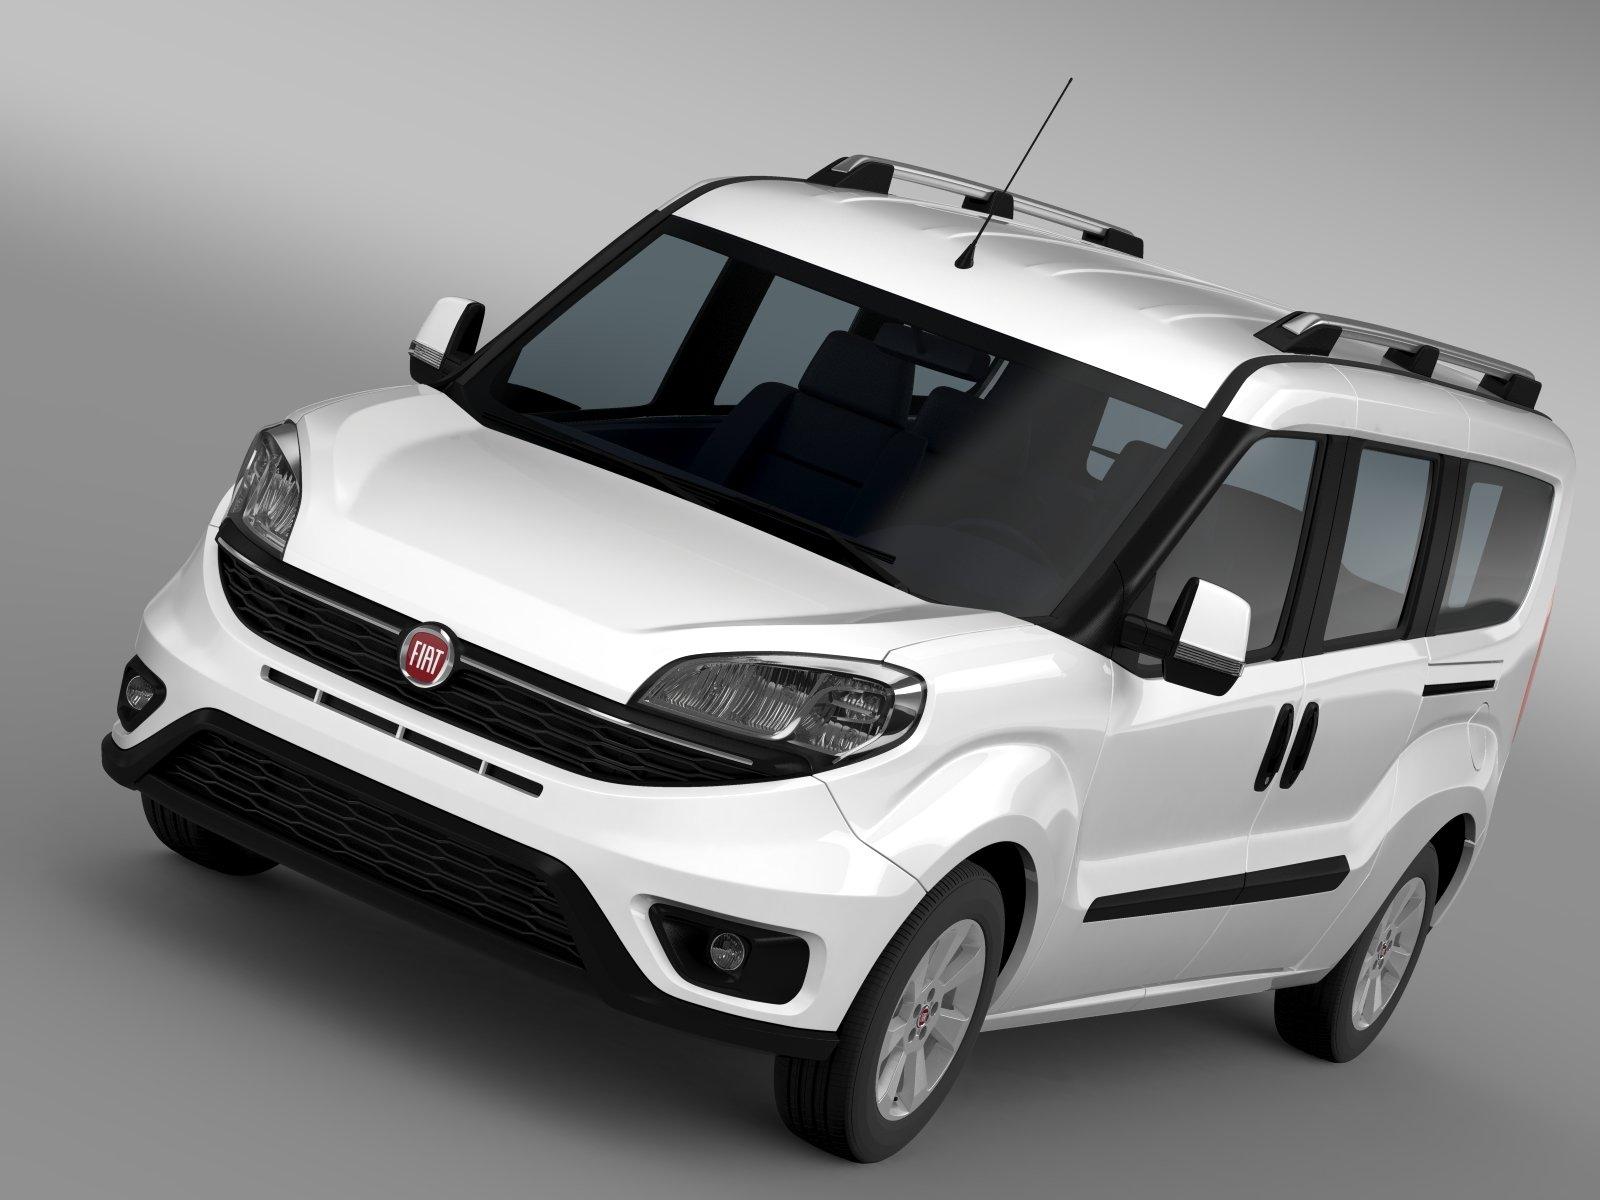 fiat doblo maxi 152 2015 vehicles creative market. Black Bedroom Furniture Sets. Home Design Ideas